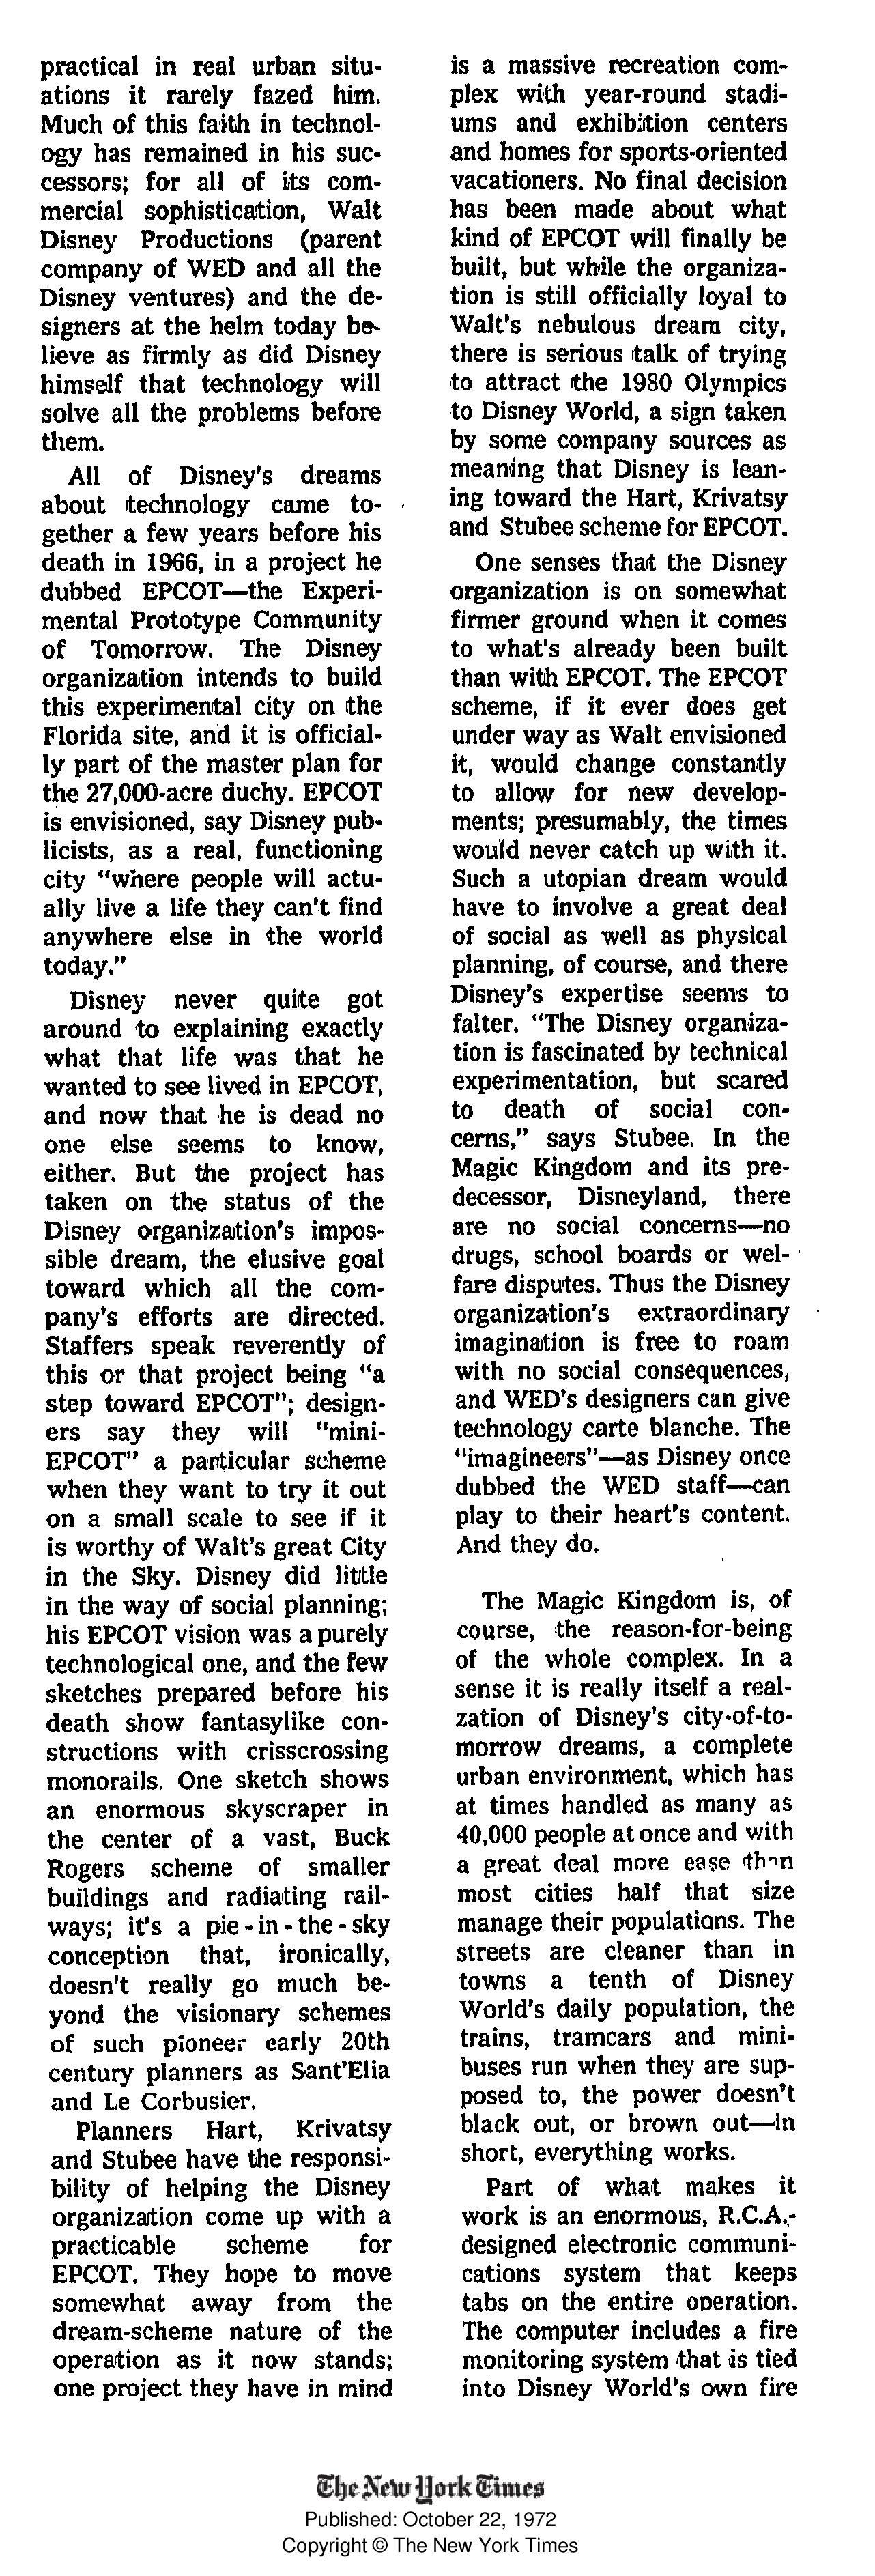 wdw1972-page-004.jpg